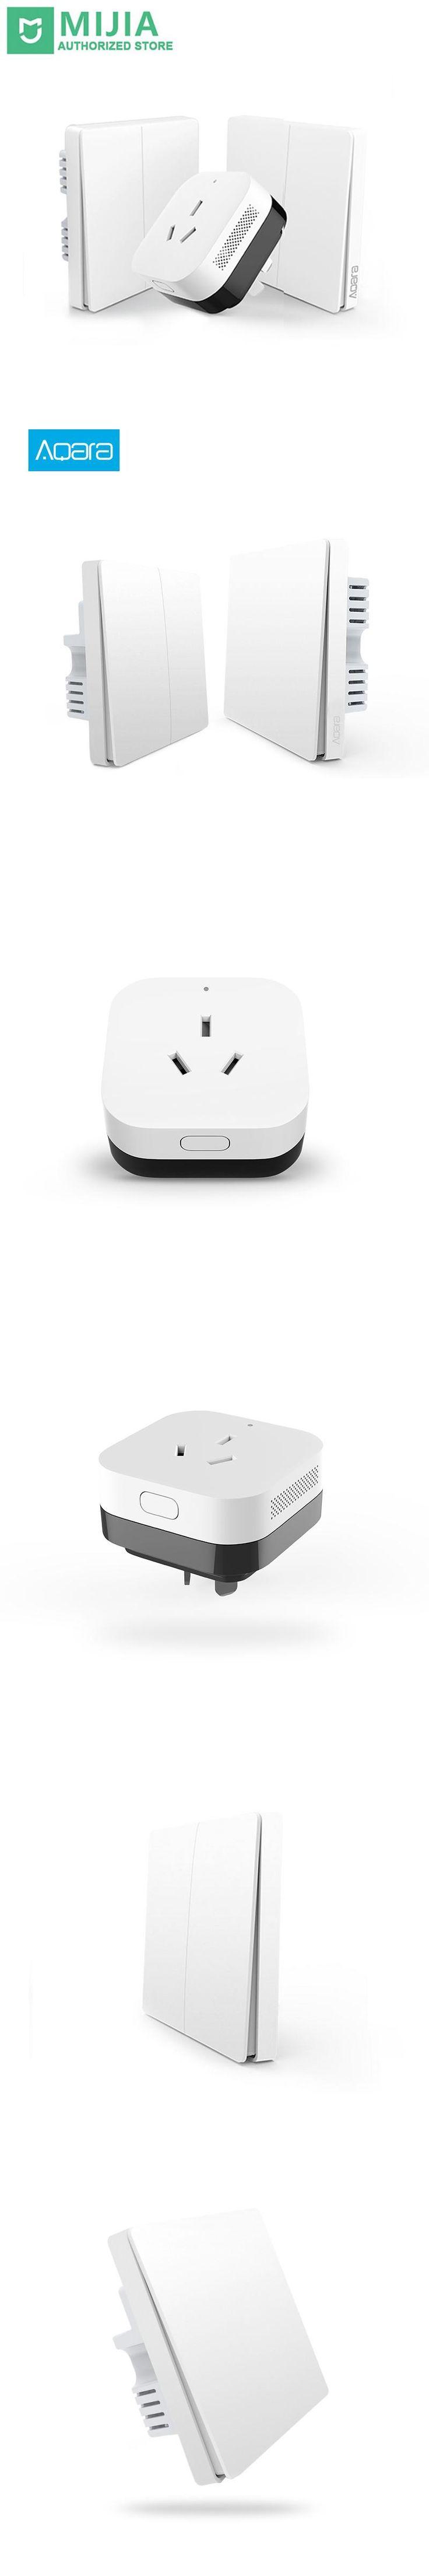 Xiaomi Smart Home Gateway 3 ,Aqara Smart Light Control ZiGBee/Wifi Wireless Key and Wall Switch Via Smarphone APP Remote